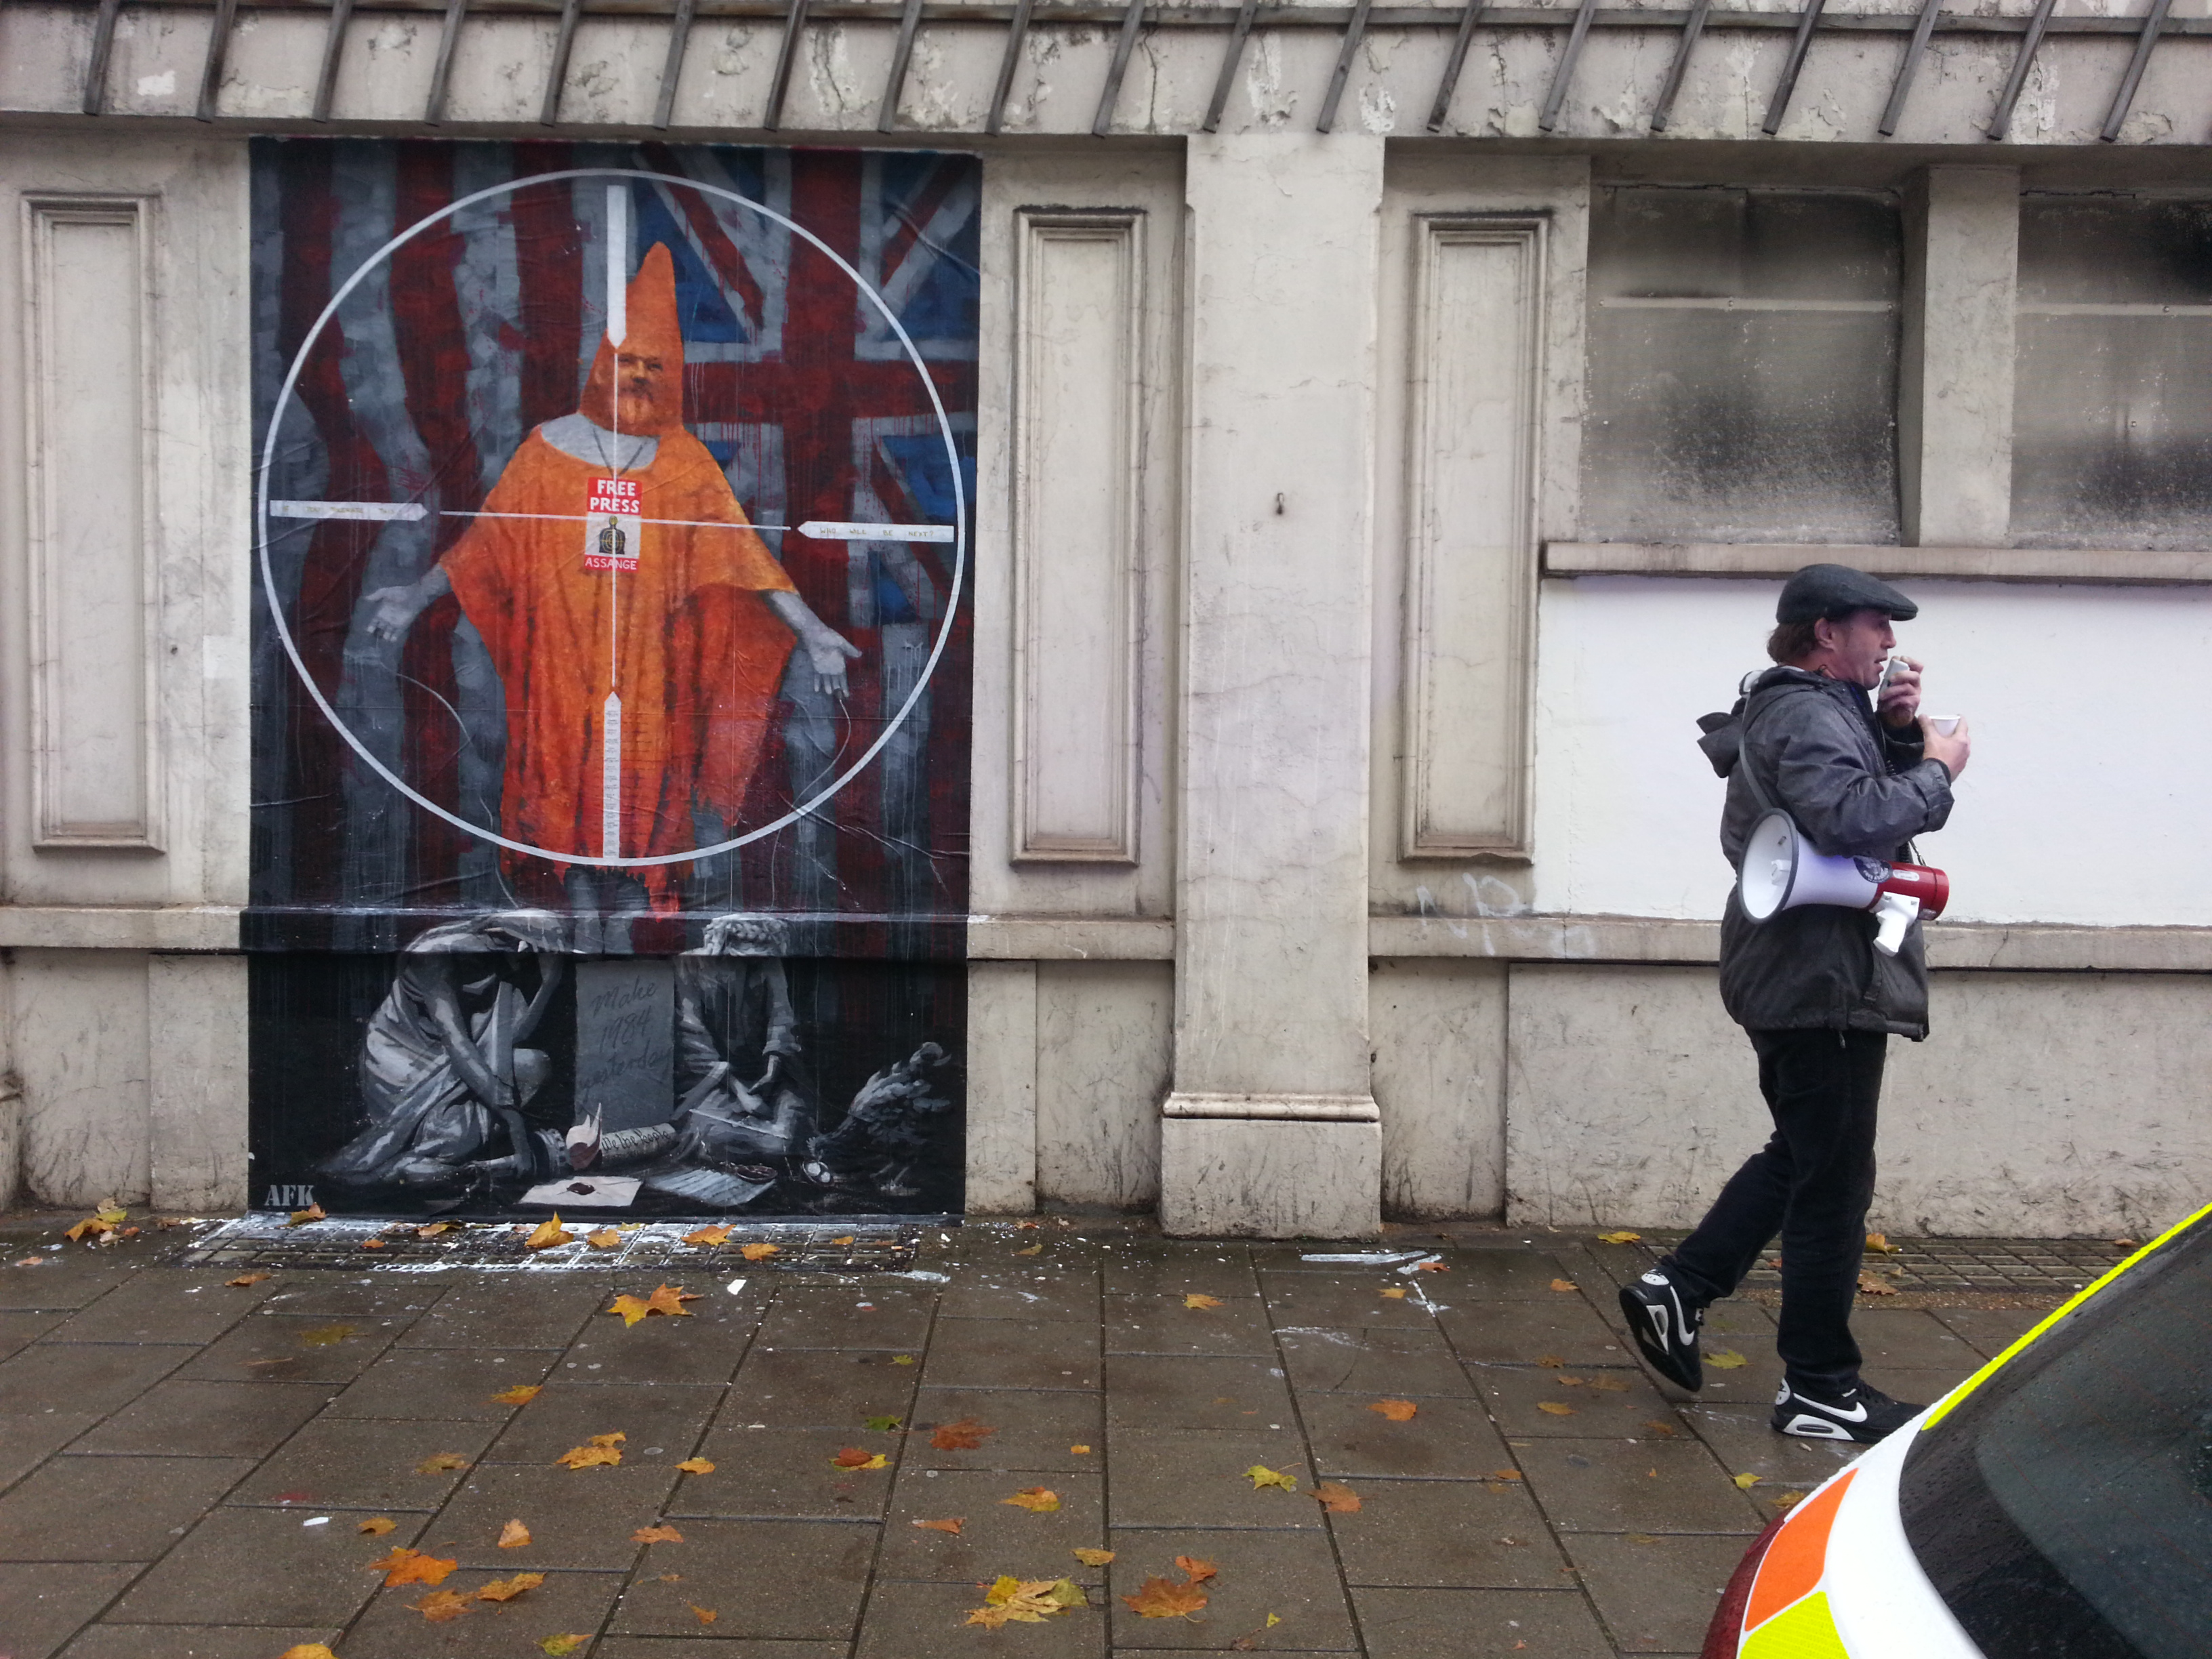 Persecution - AFK (Norwegian street artist)